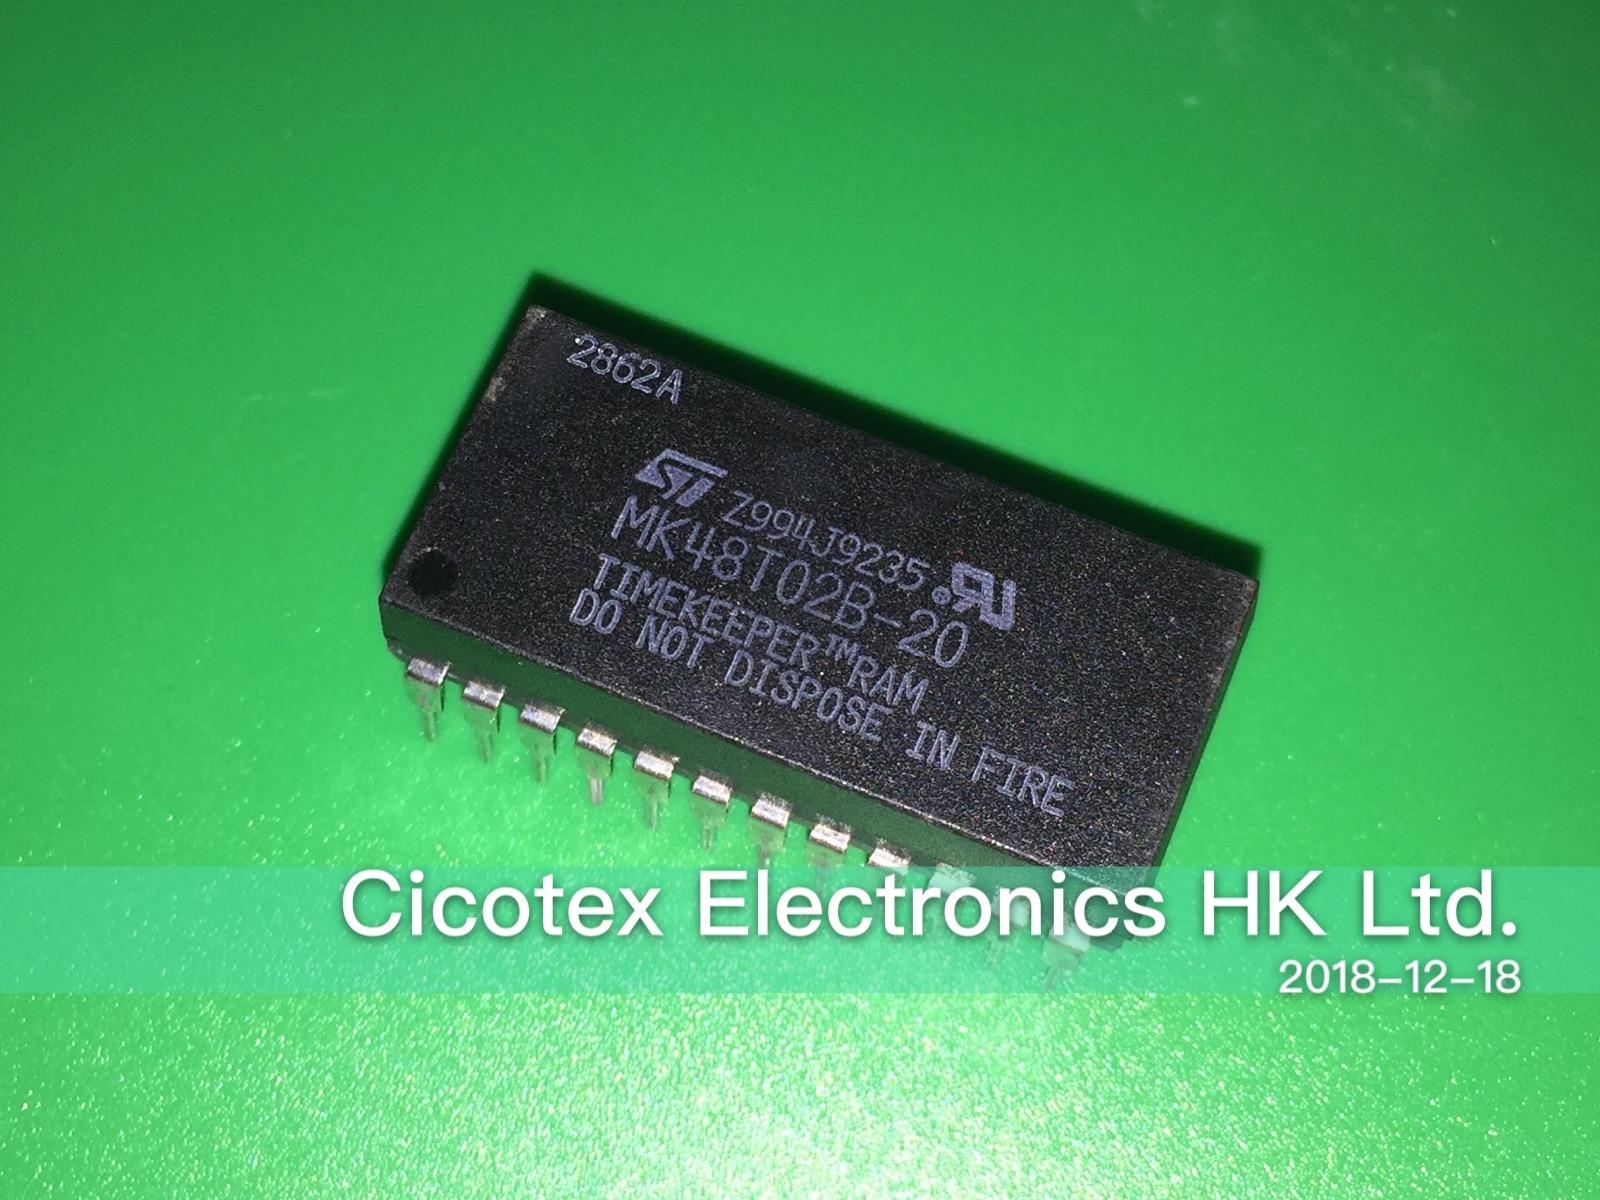 MK48T02B-20 DIP-24 CMOS 2K x 8 TIMEKEEPER SRAM MK48T02B20 MK48T028-20